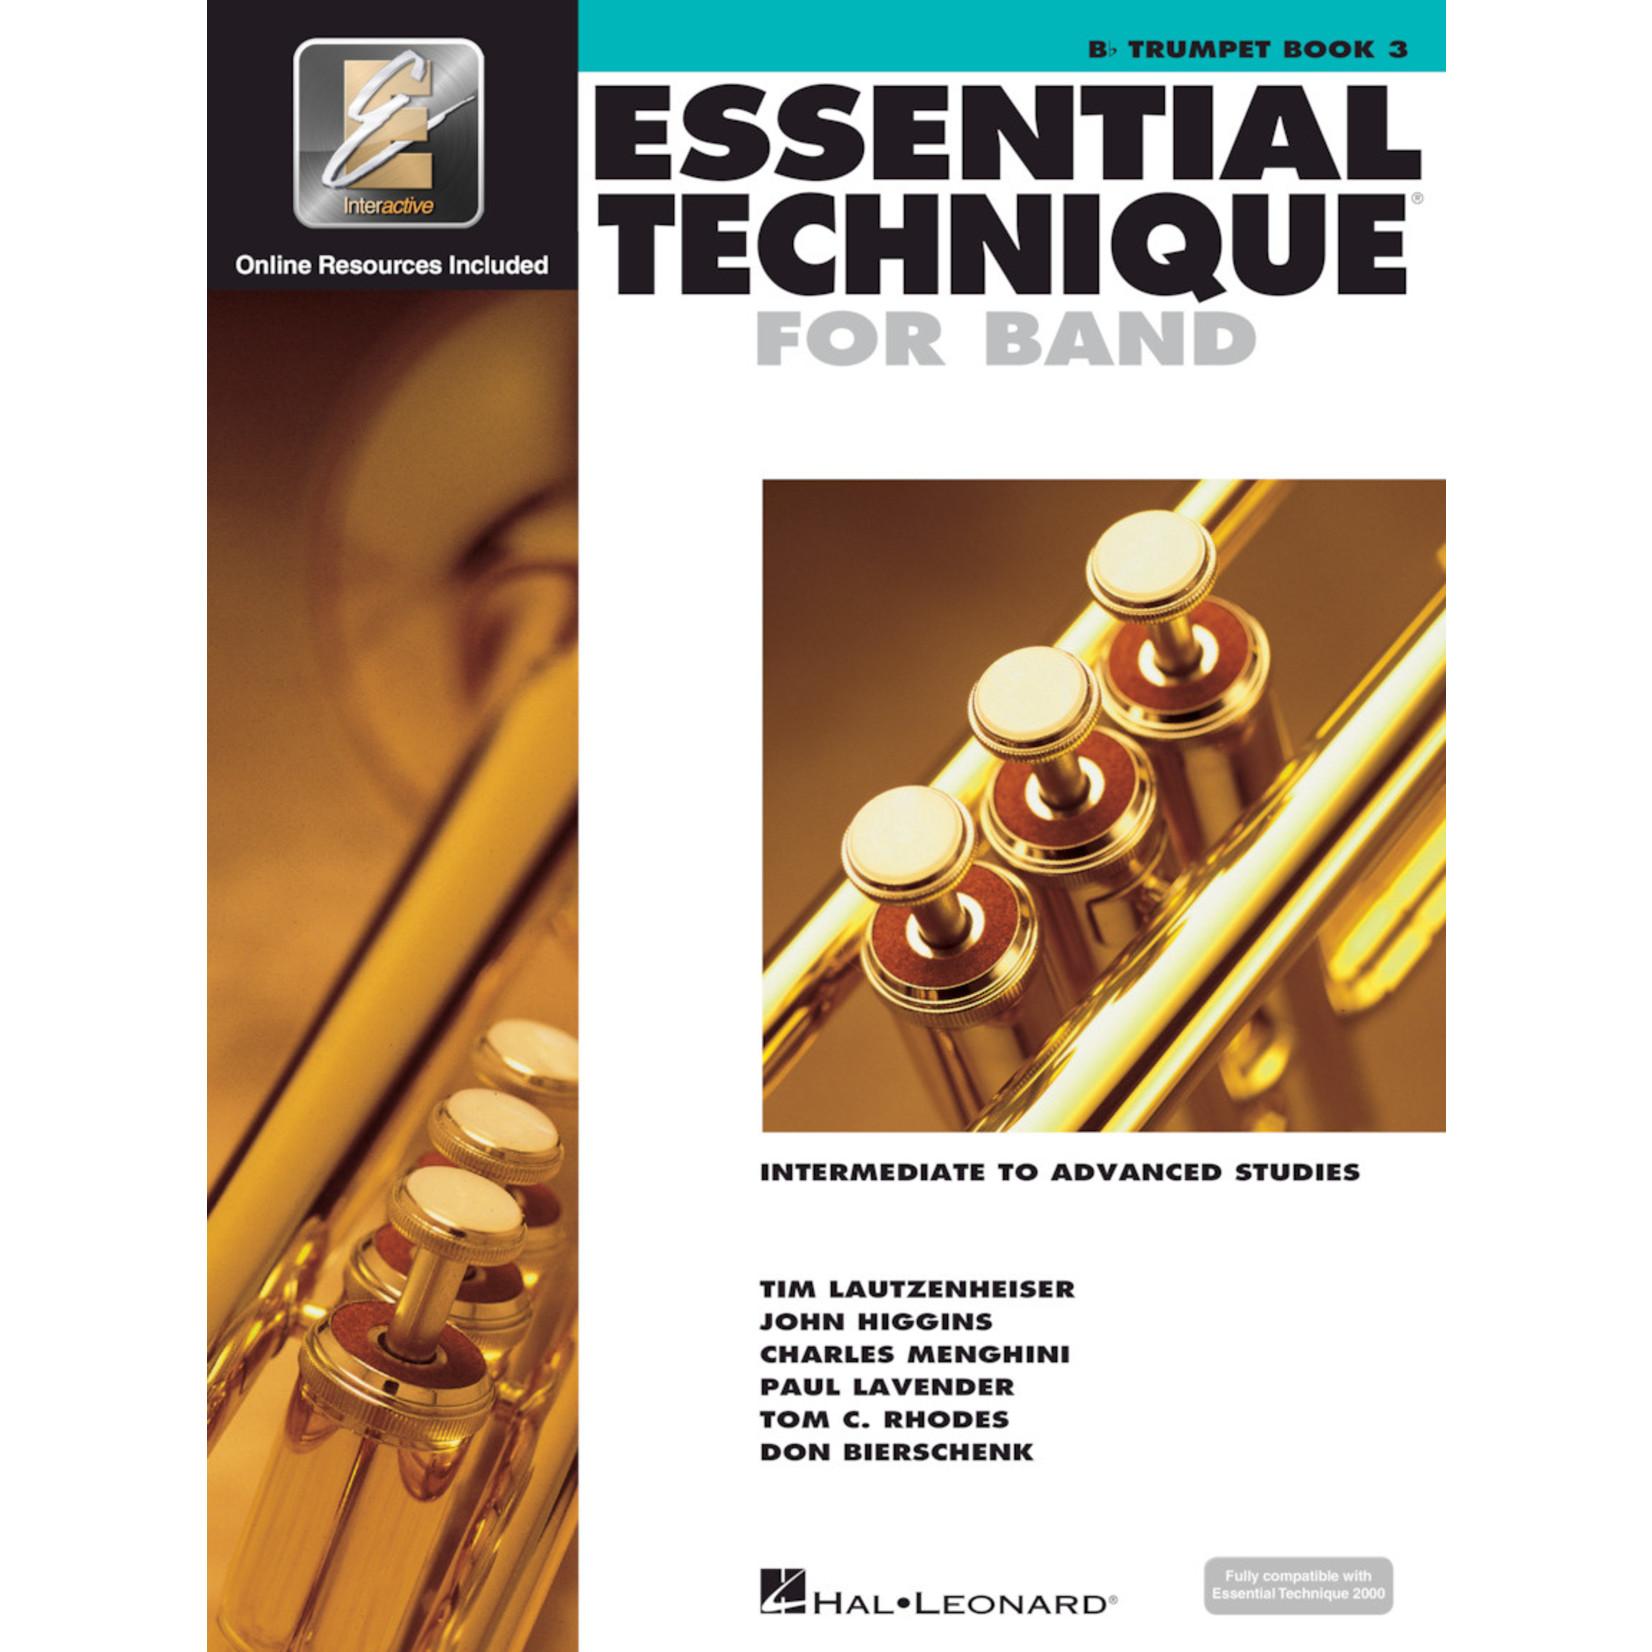 Hal Leonard Essential Technique for Band Trumpet Book 3